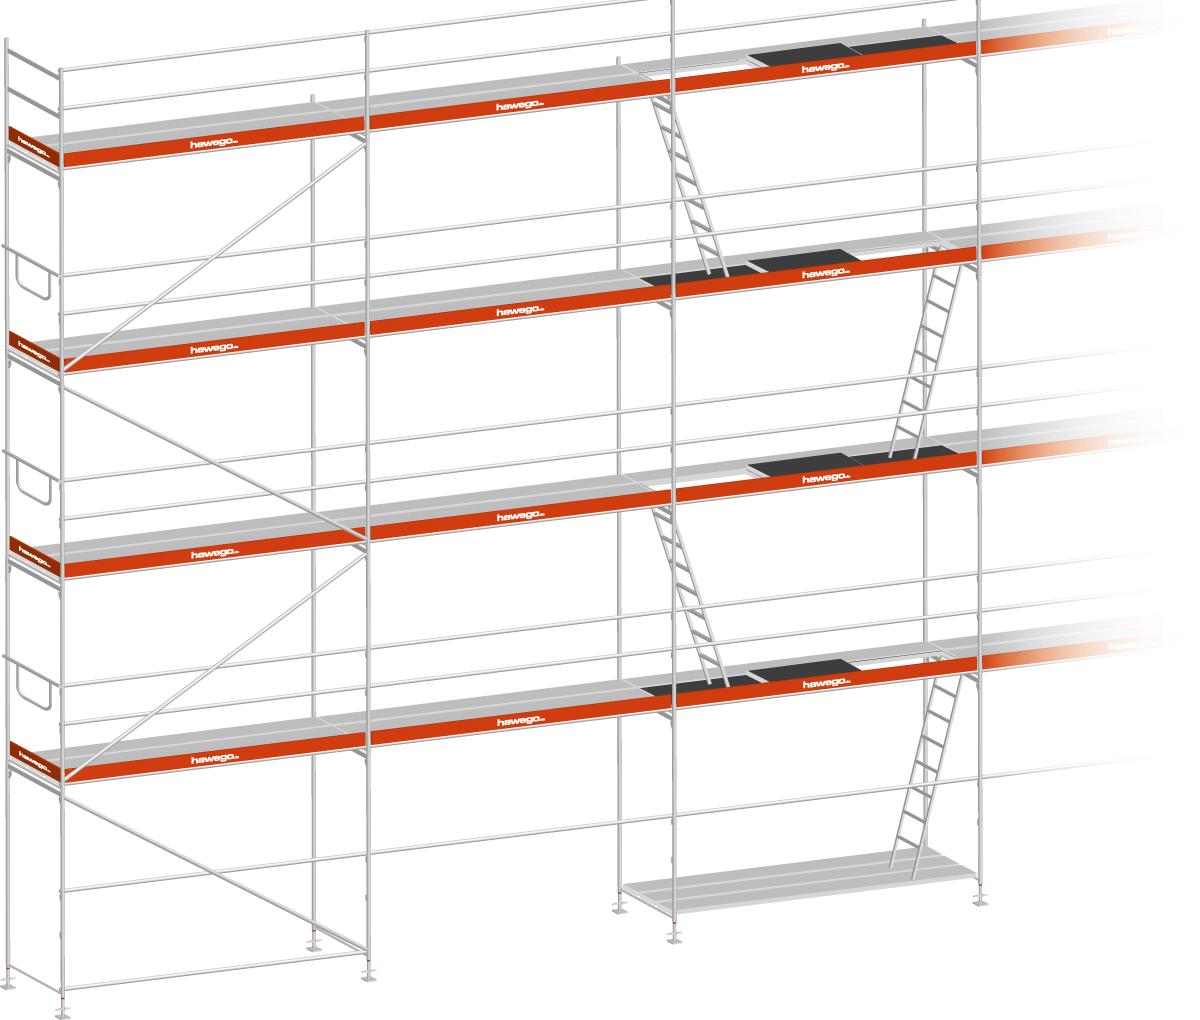 Layher Blitz Gerüst 100 Stahl - Feldlänge 2,57 m